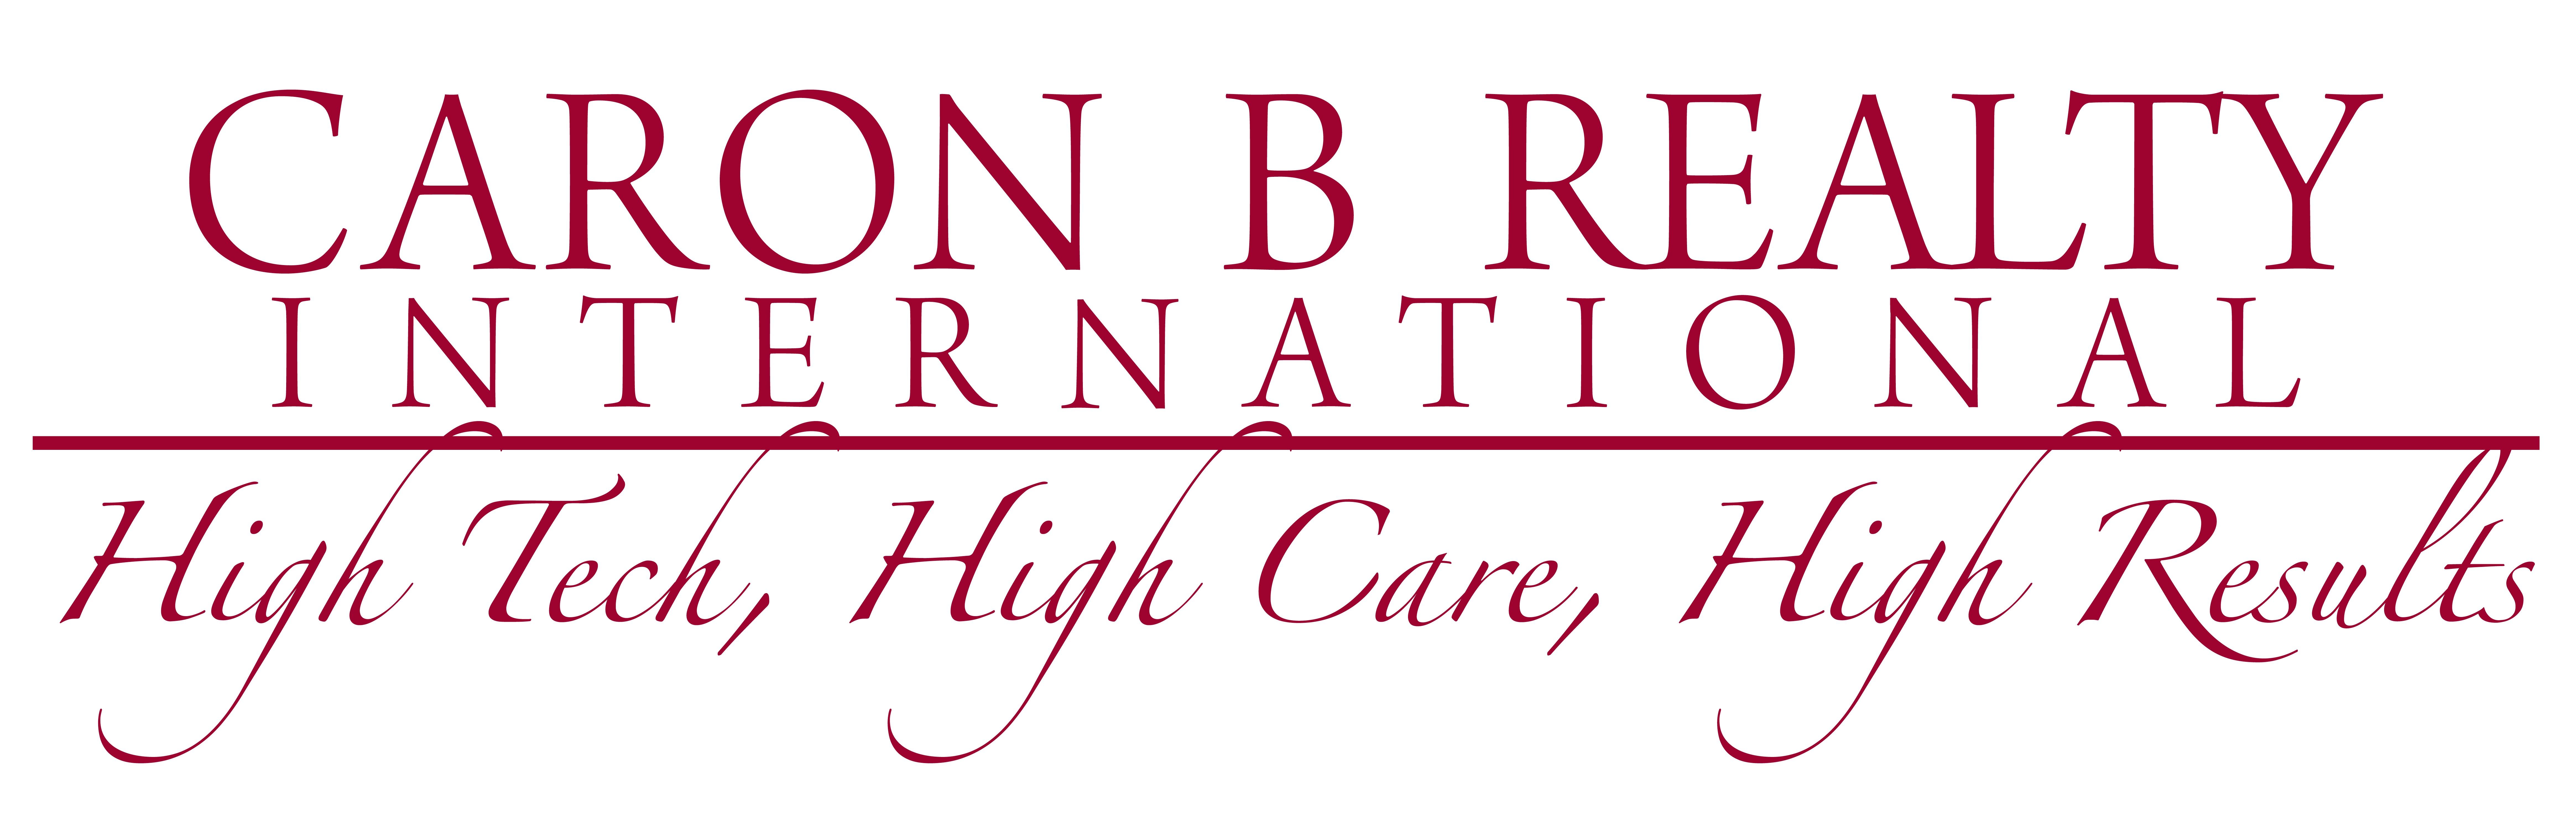 Caron B Realty International logo